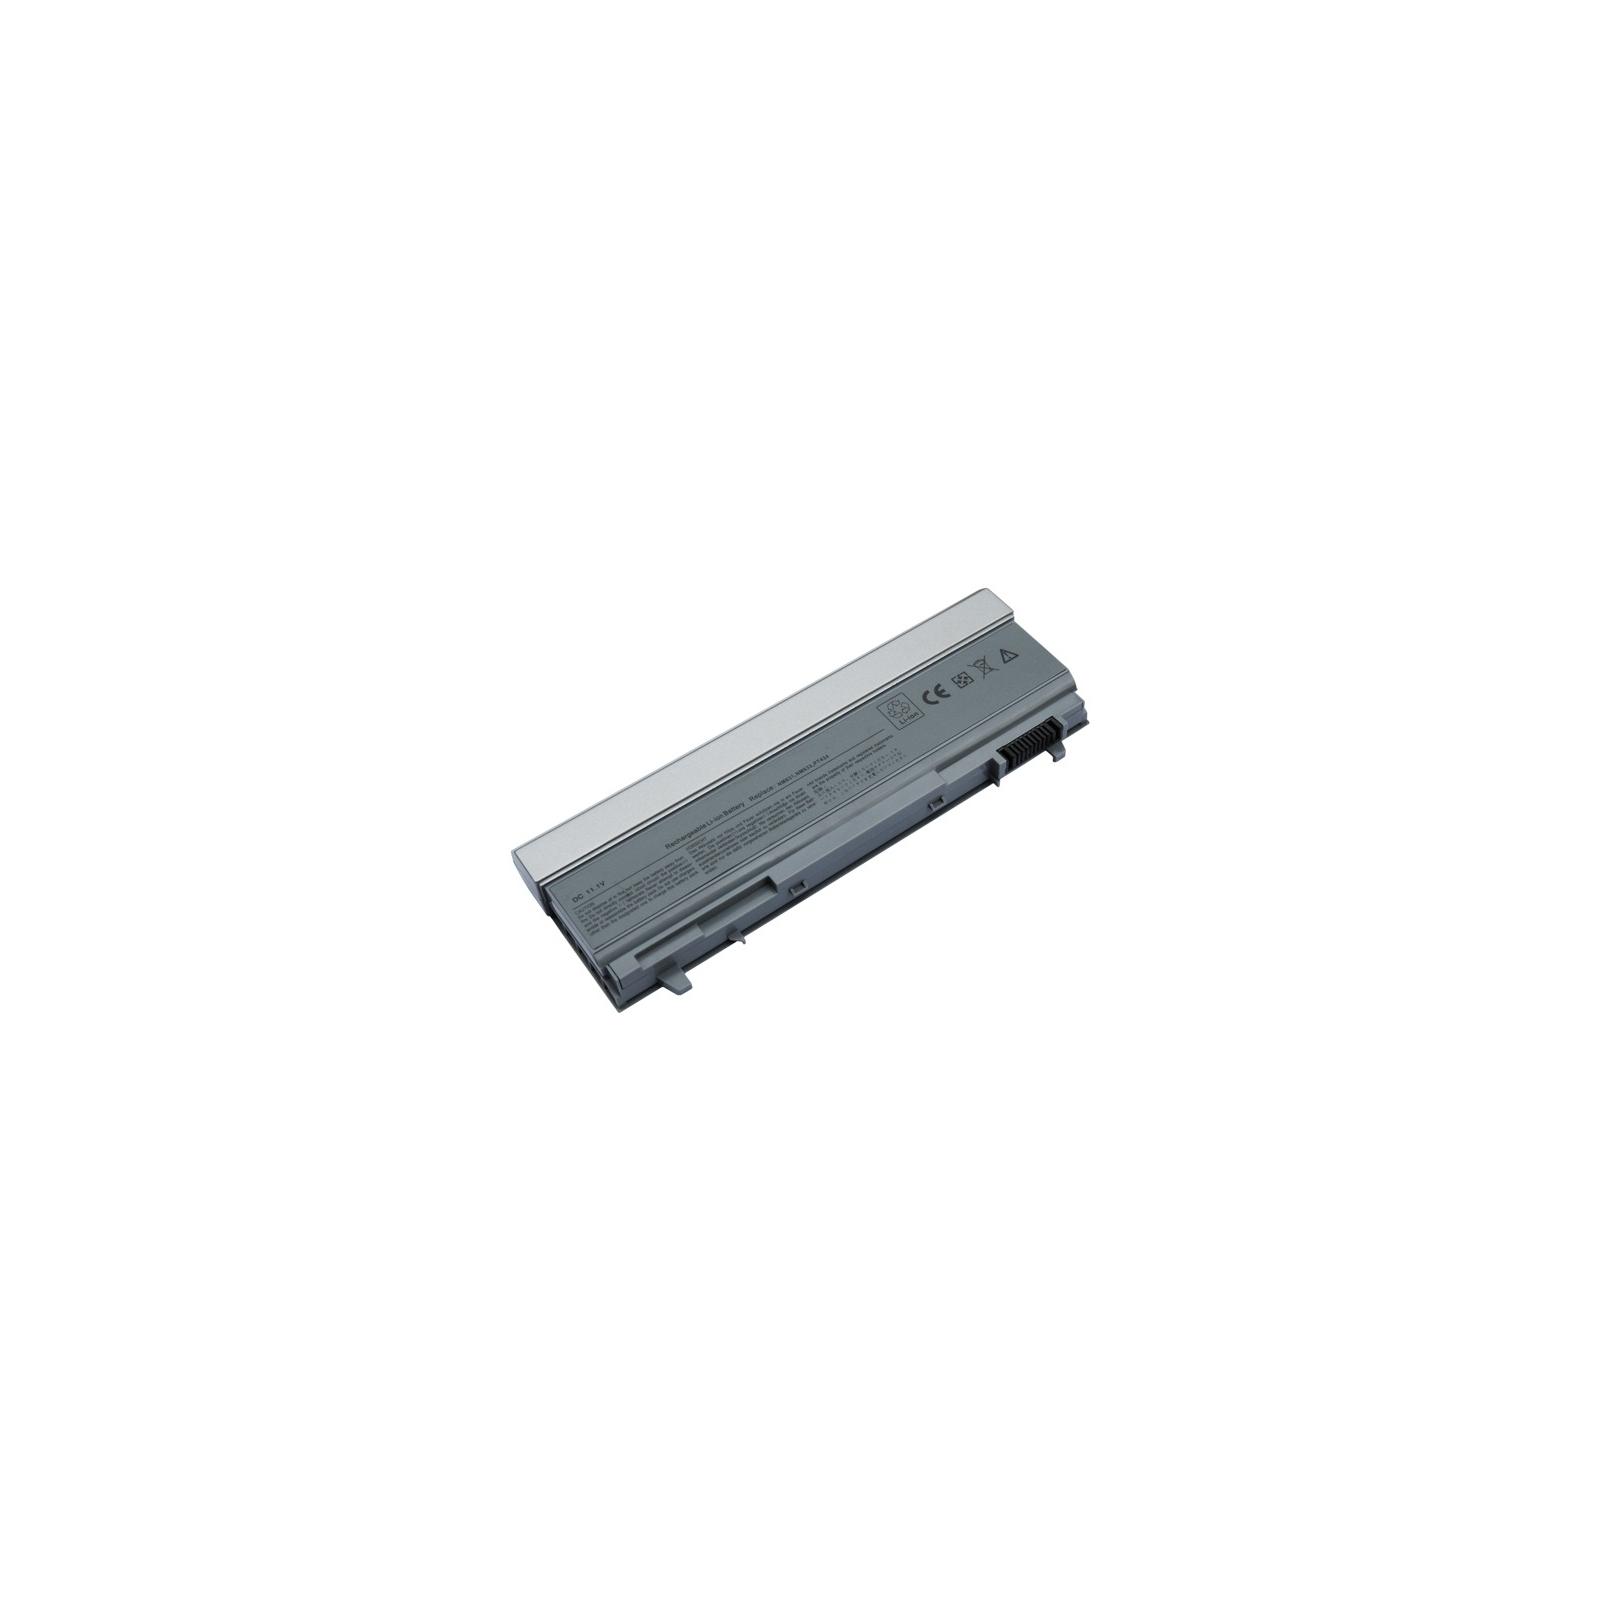 Аккумулятор для ноутбука DELL Latitude E6400 (NM633, DE E6400 3SP2) 11.1V 5200mAh PowerPlant (NB00000111)